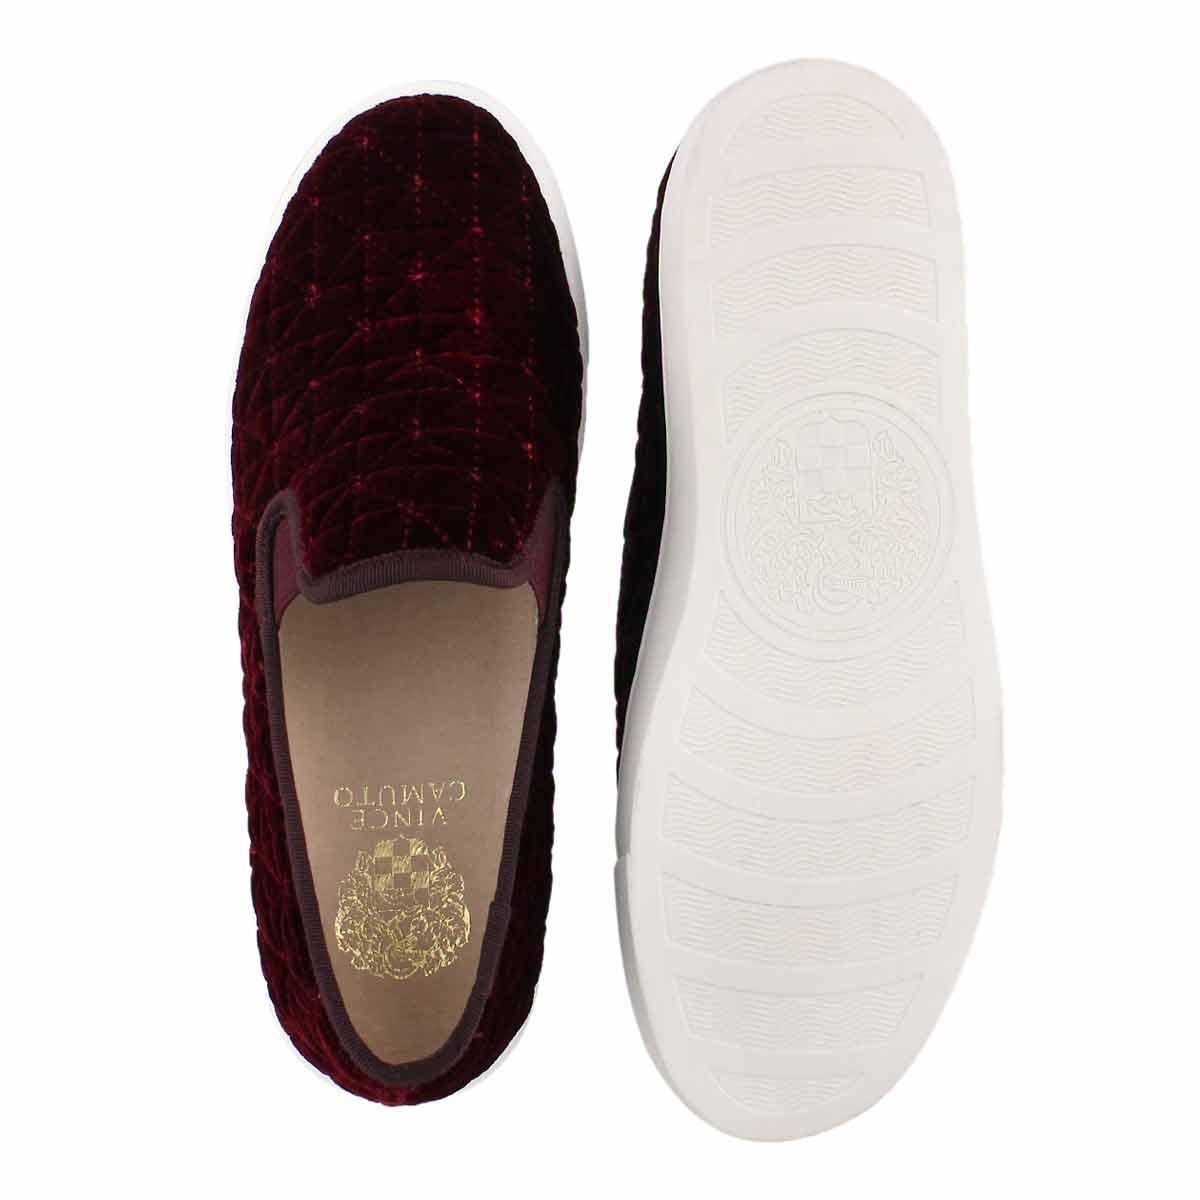 Lds Billena wine casual slip on shoe